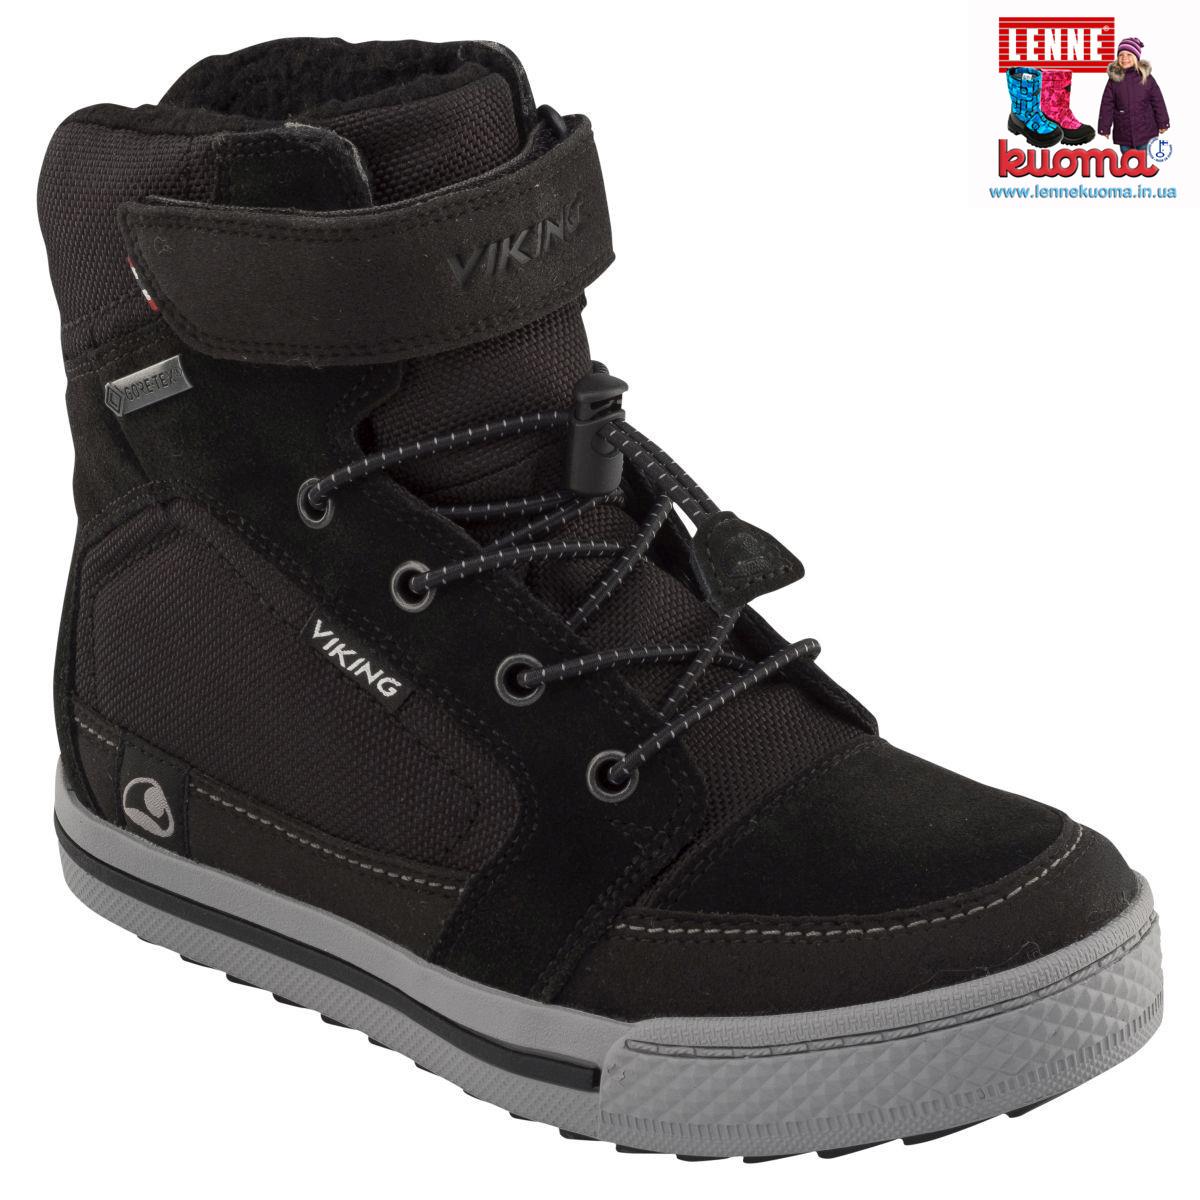 VIKING ZING GORE TEX  зимние ботинки. Размеры 31-41